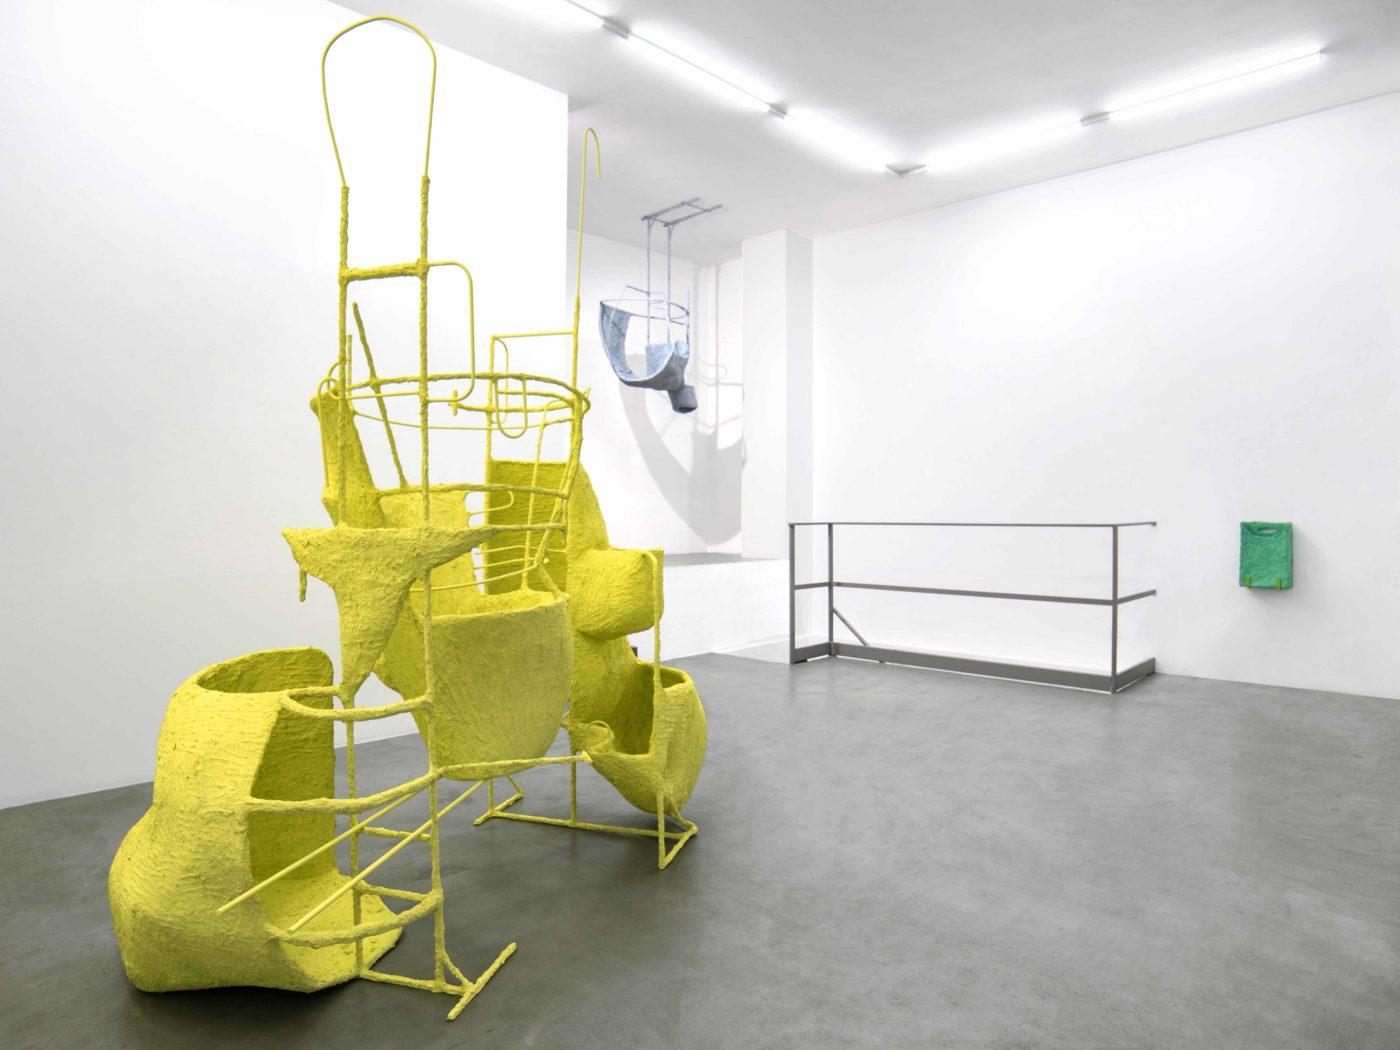 Olivia Bax - Chute, Ribot arte contemporanea, Milano